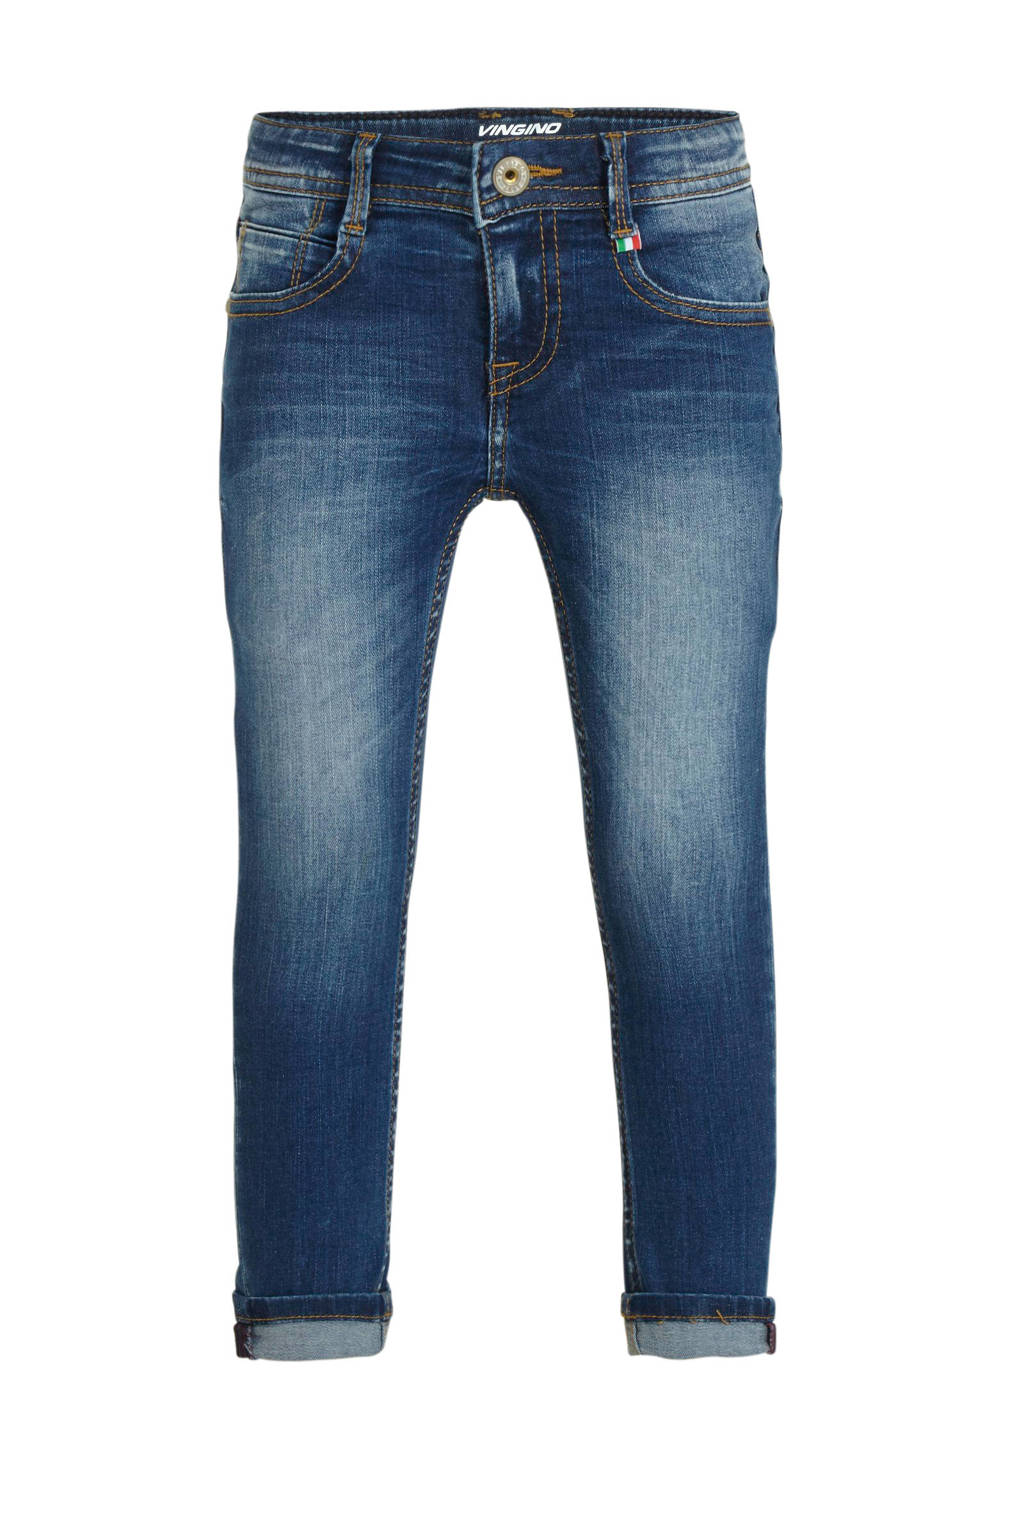 Vingino super skinny jeans Apache blue vintage